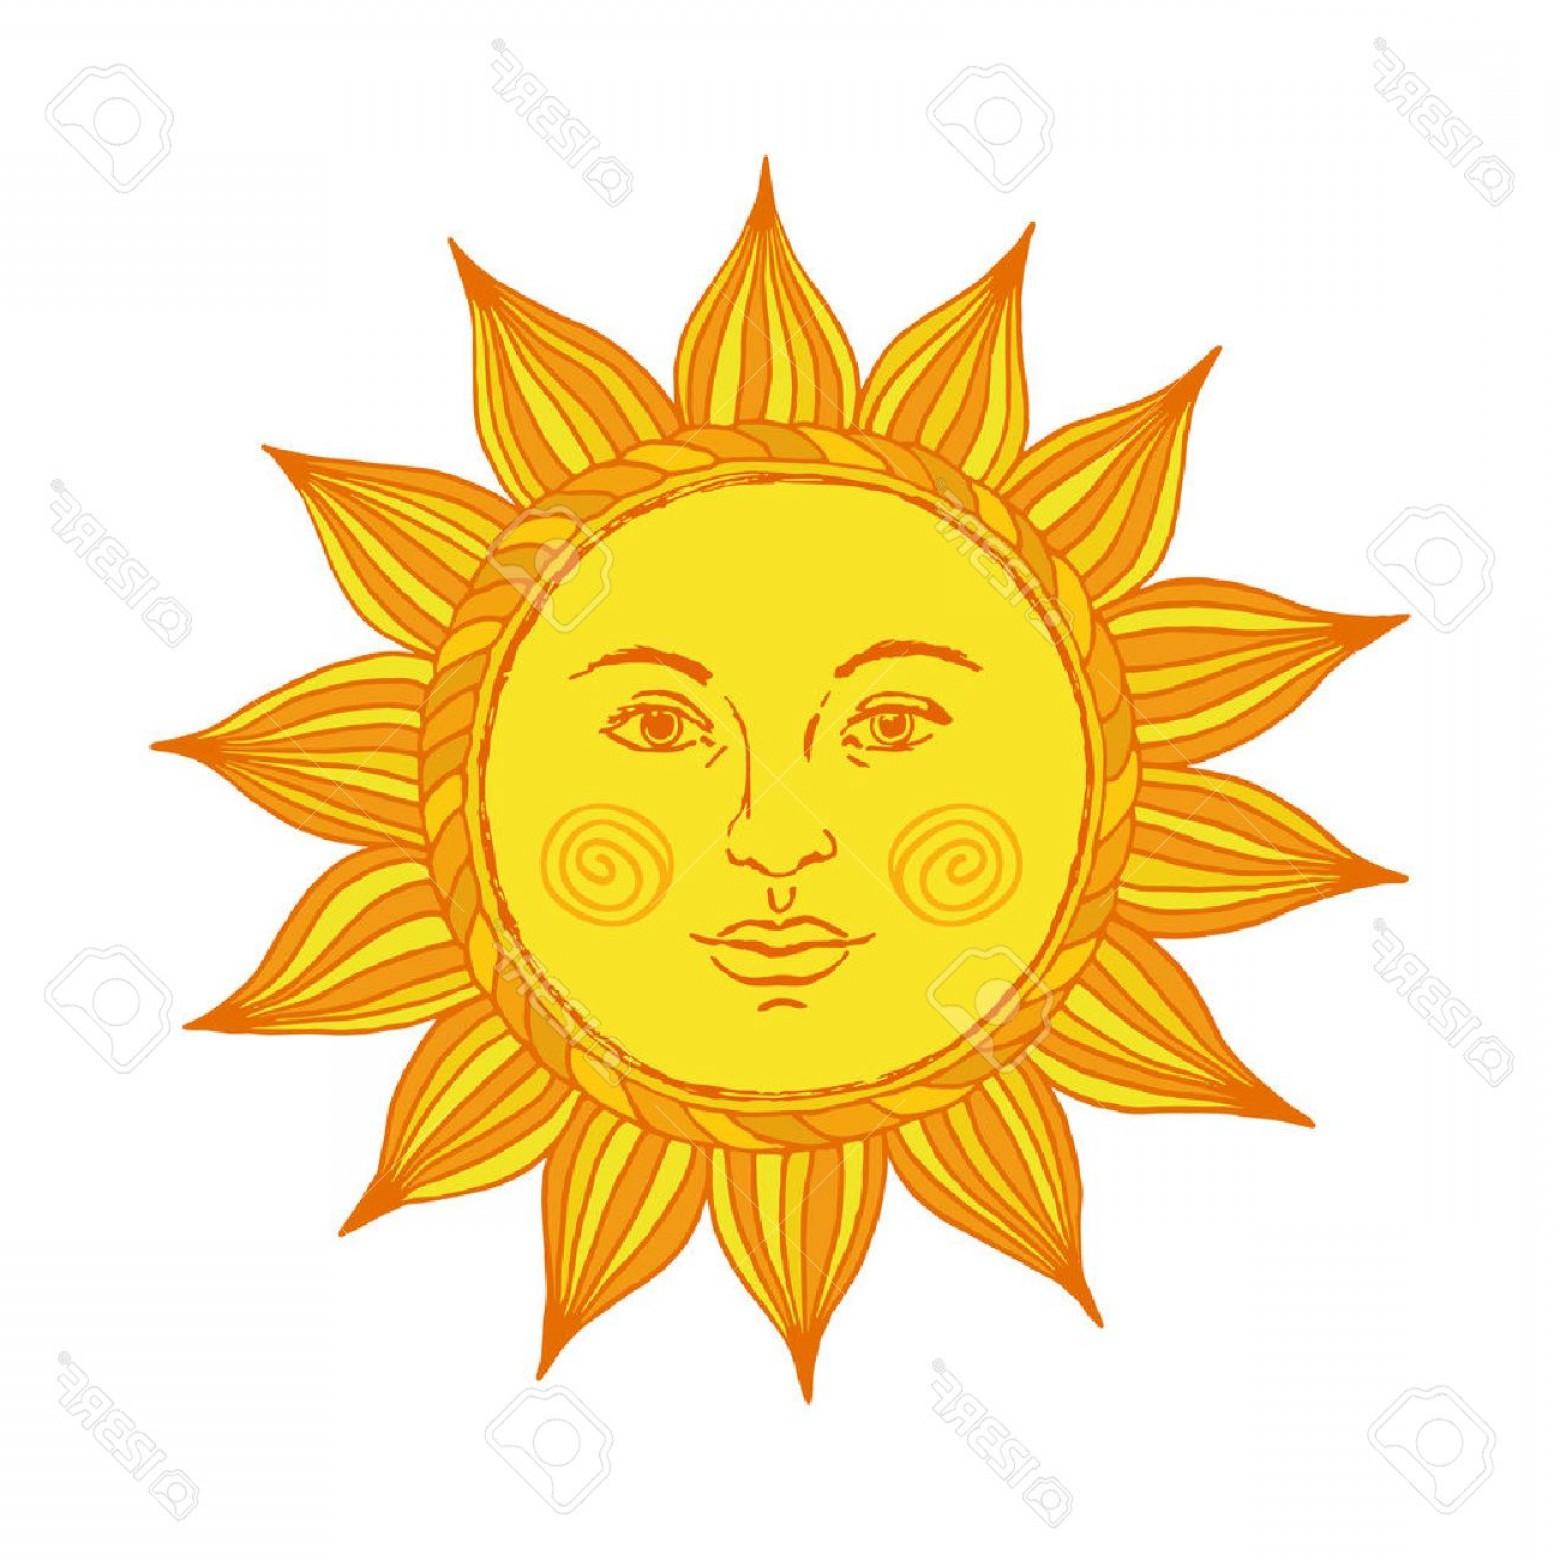 1560x1560 Photostock Vector Hand Drawn Sun With Face And Eyes Alchemy